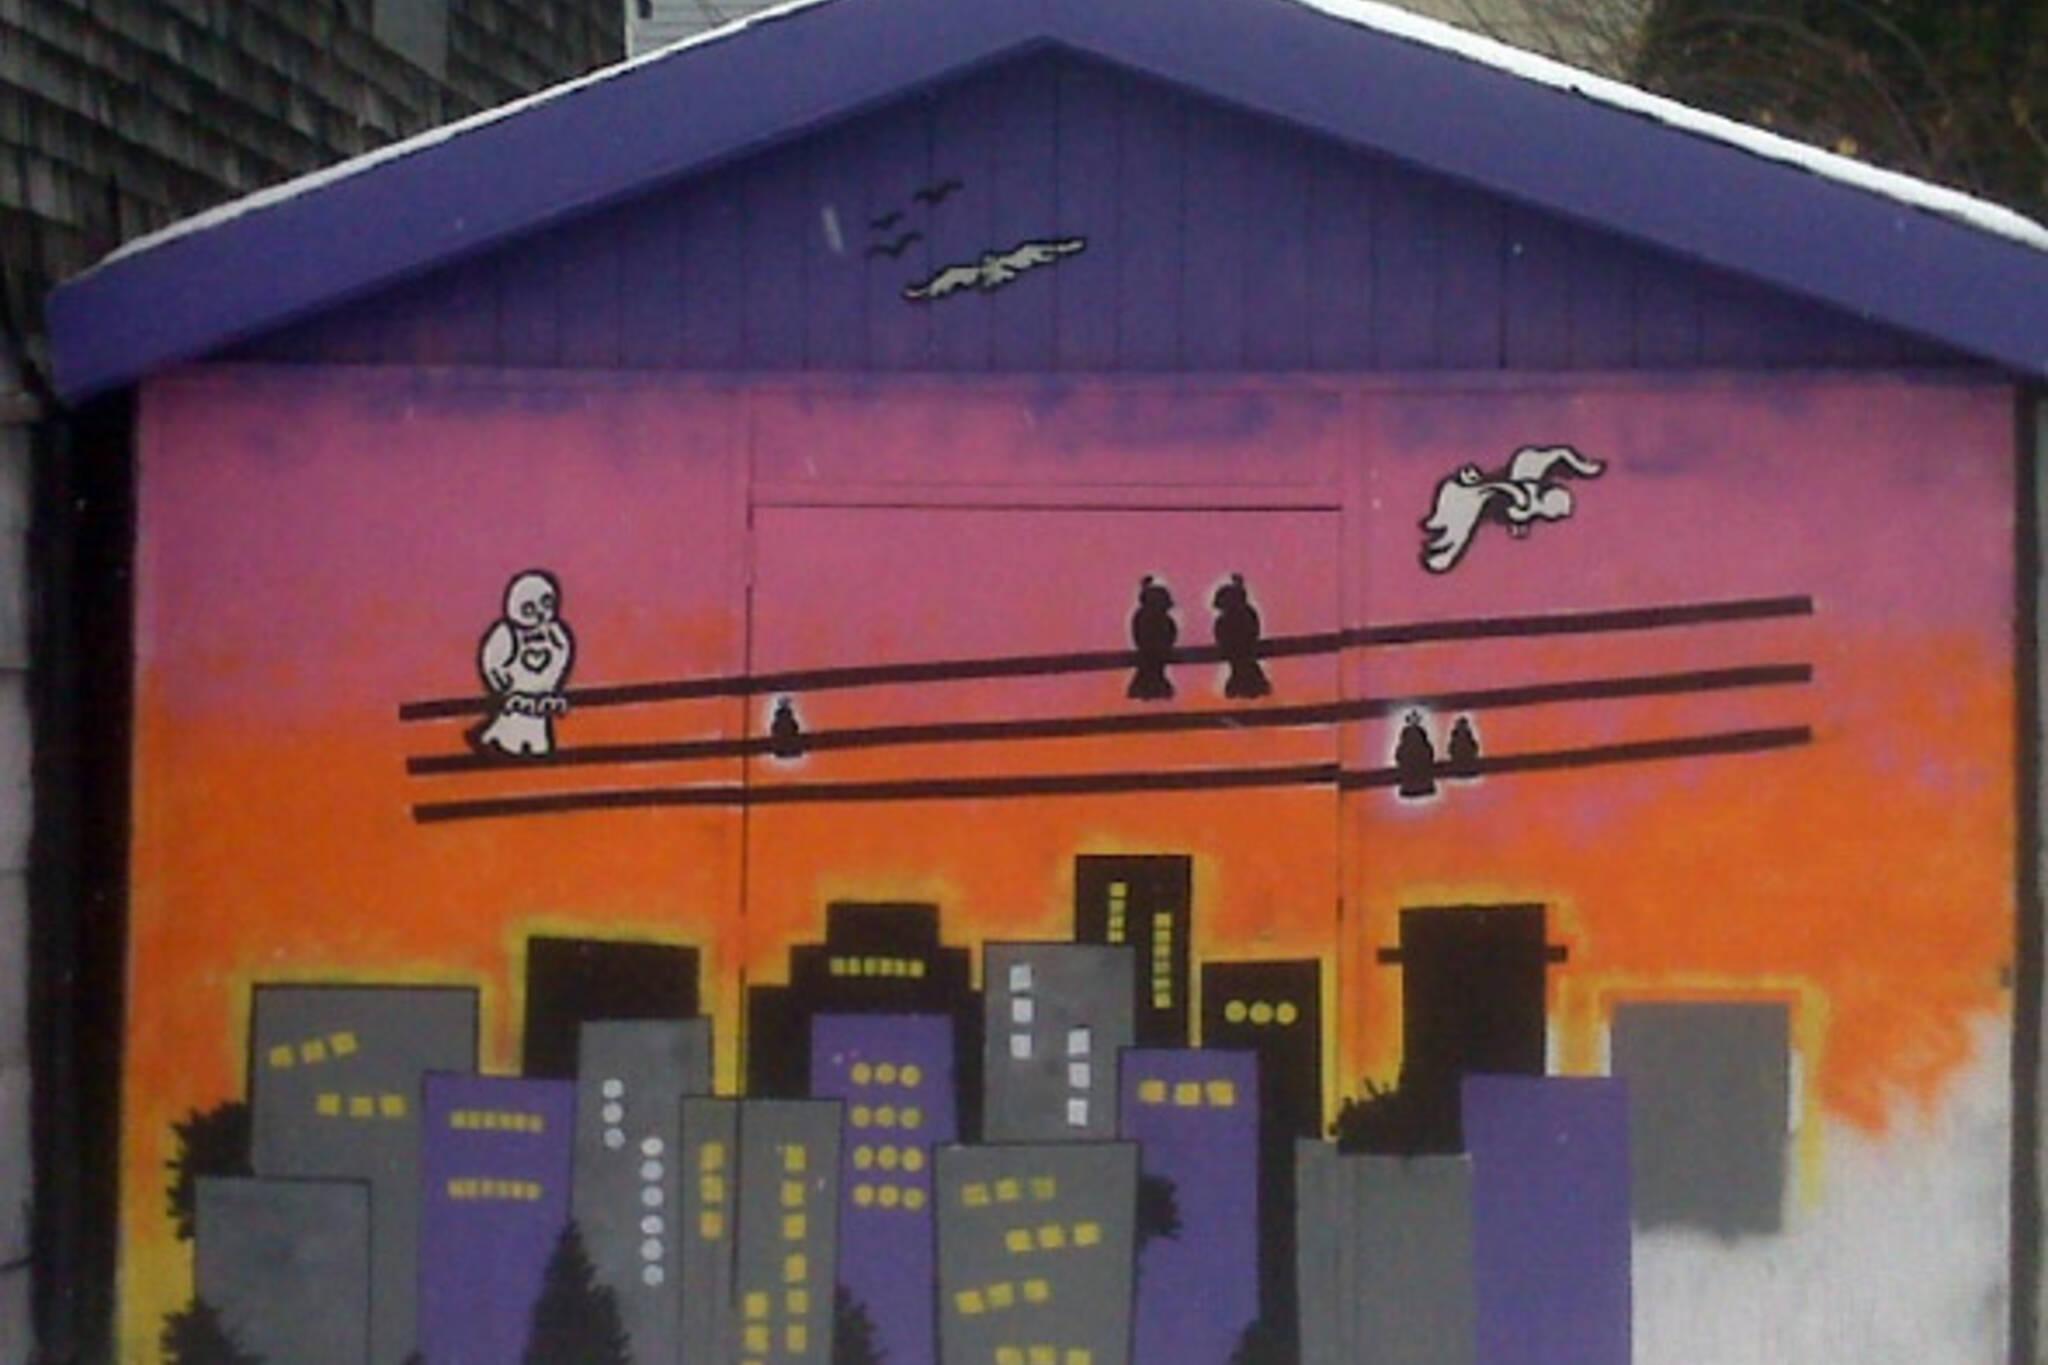 Toronto Graffiti by-law